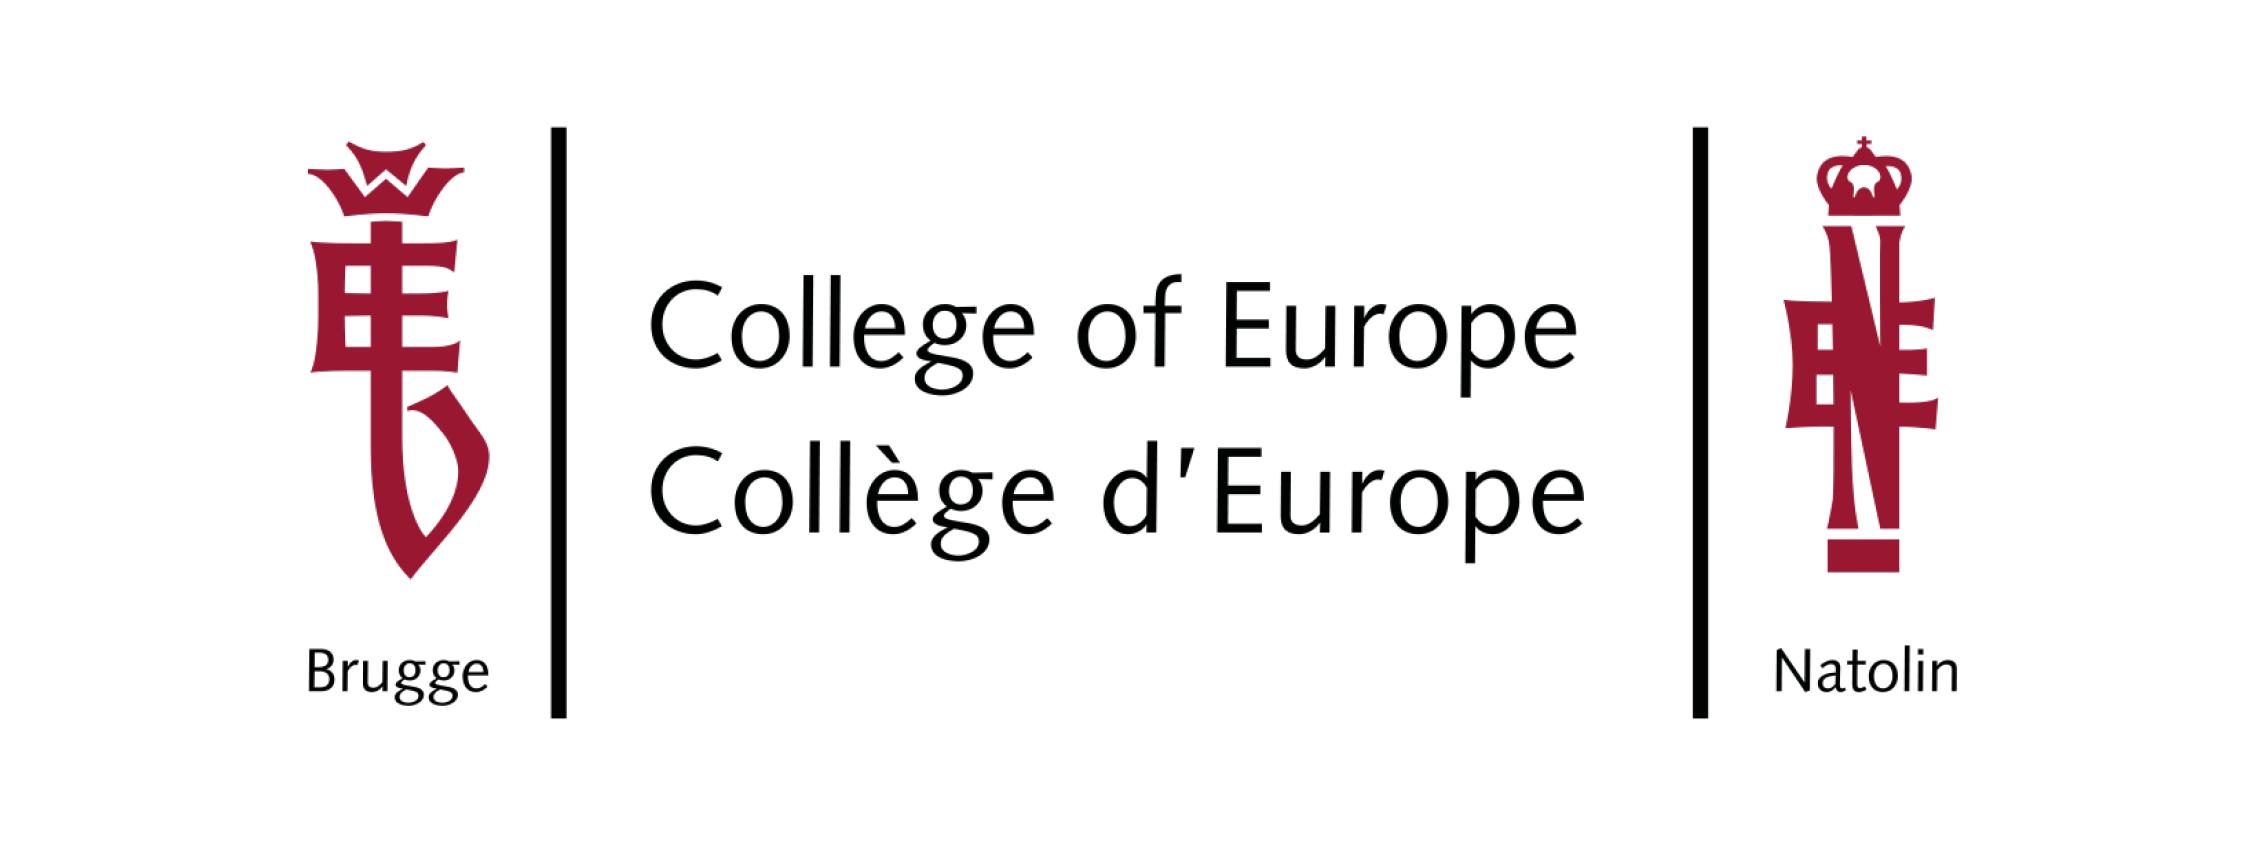 collège d'europe logo